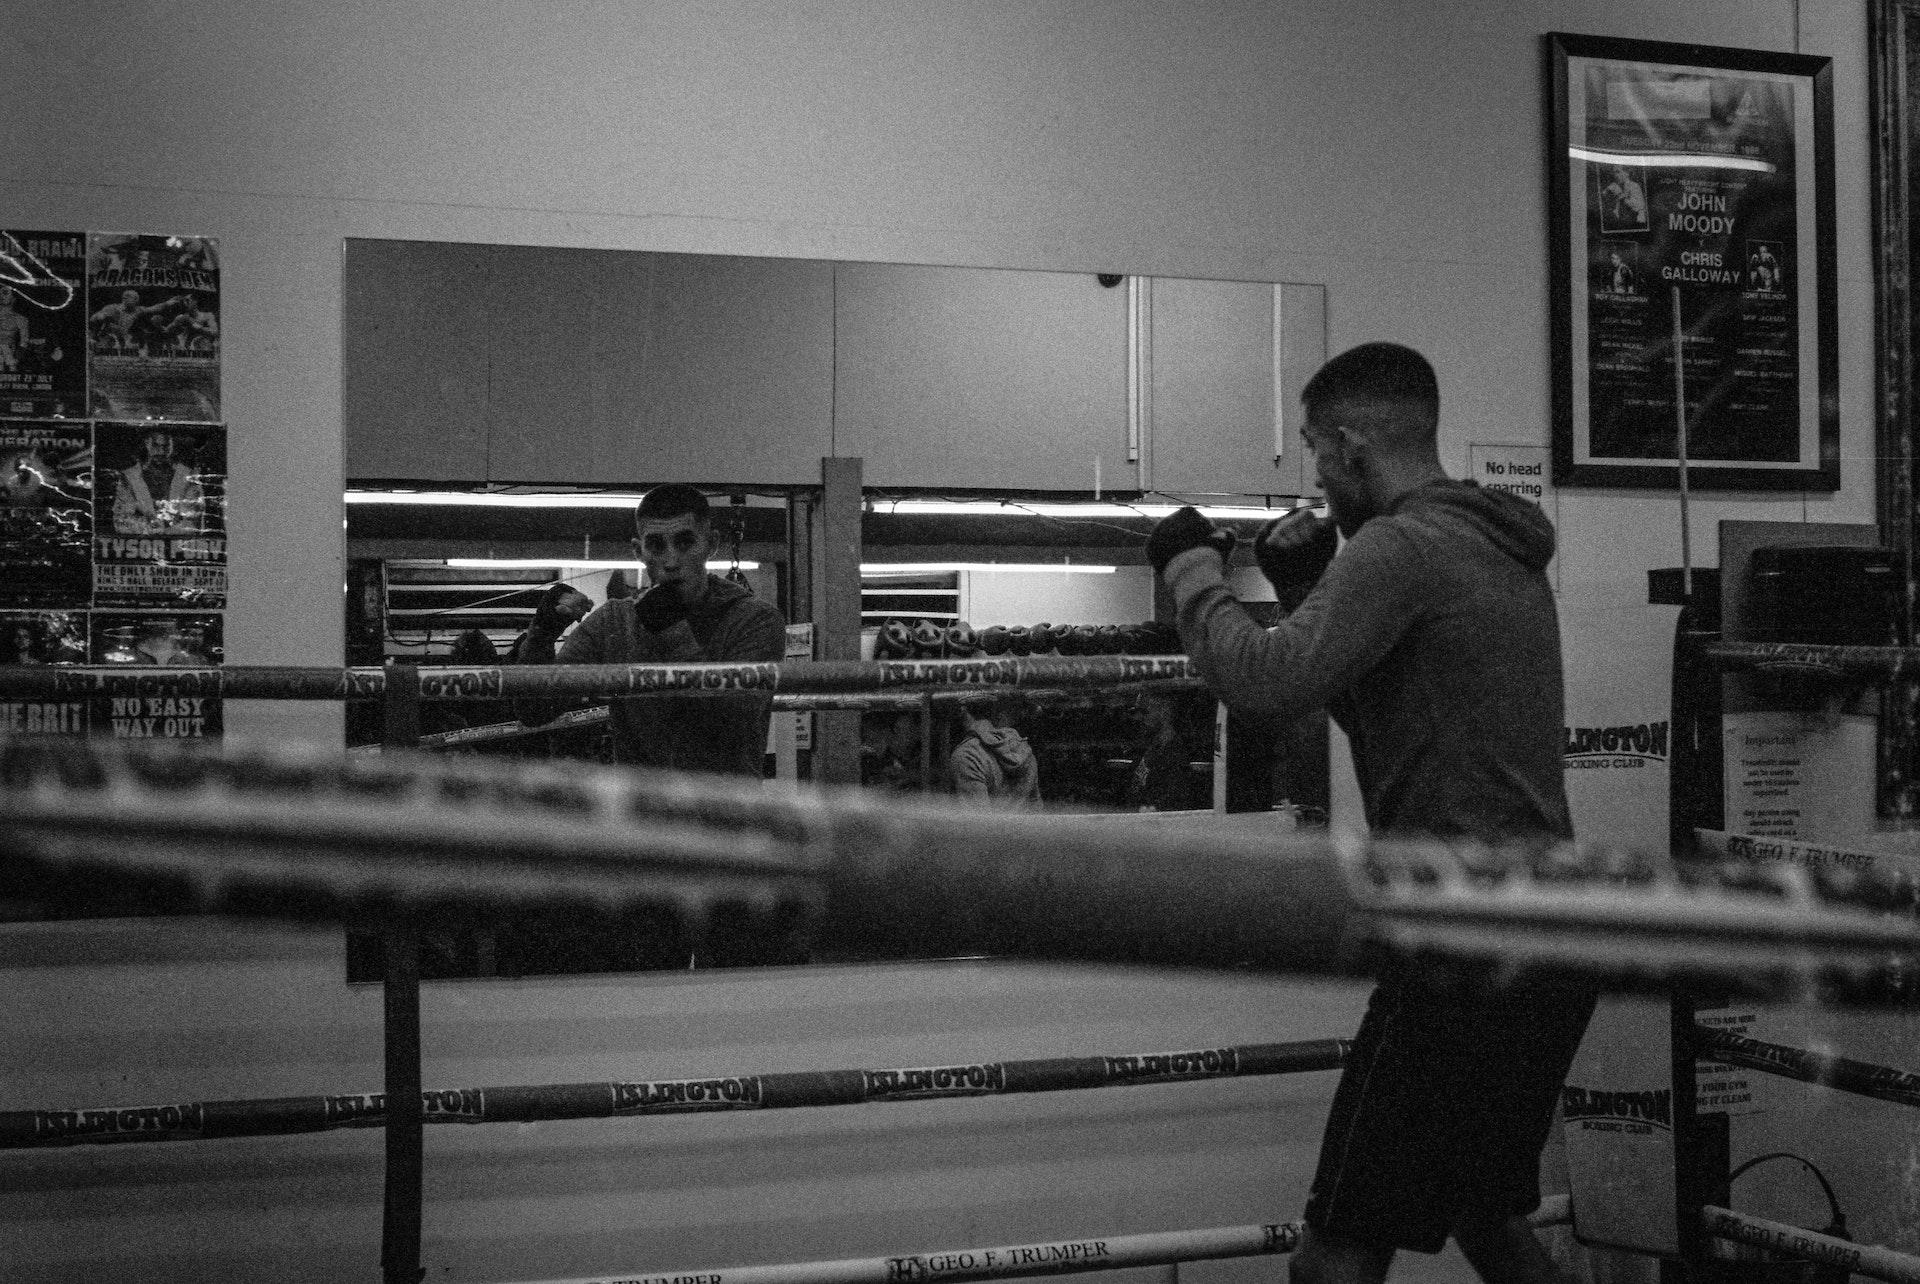 Islington_Boxing_Club-36